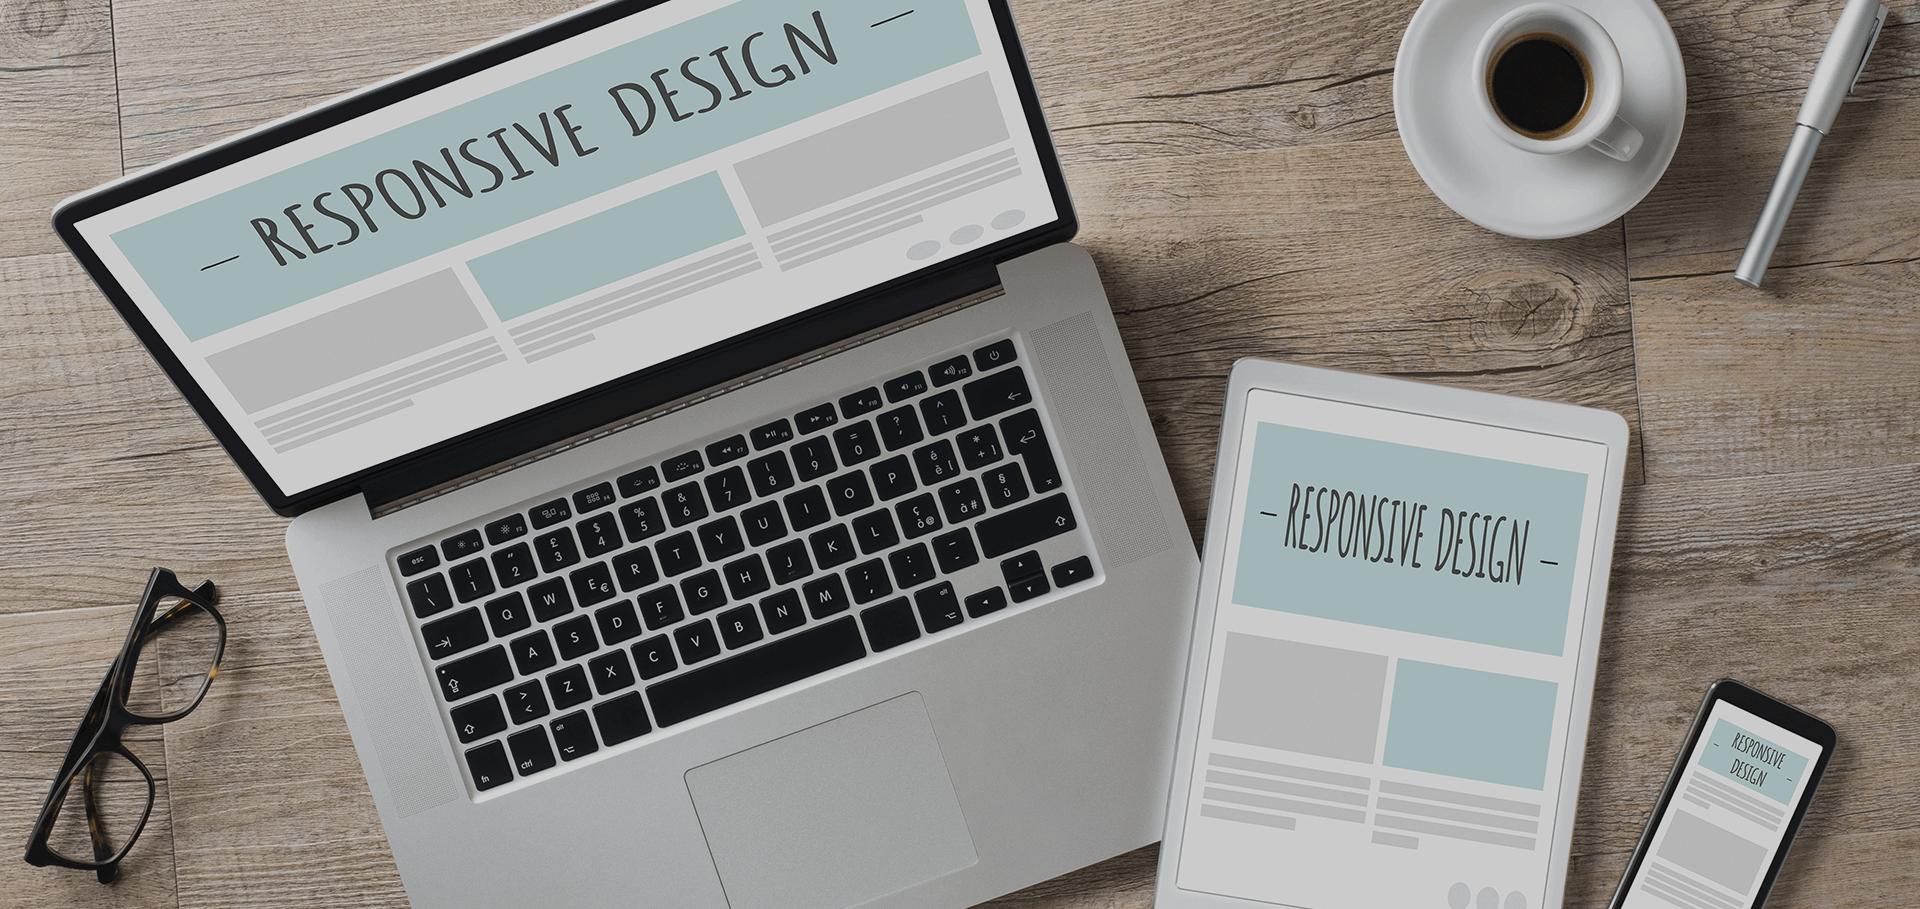 Responsive design: τί είναι και γιατί είναι σημαντικό;